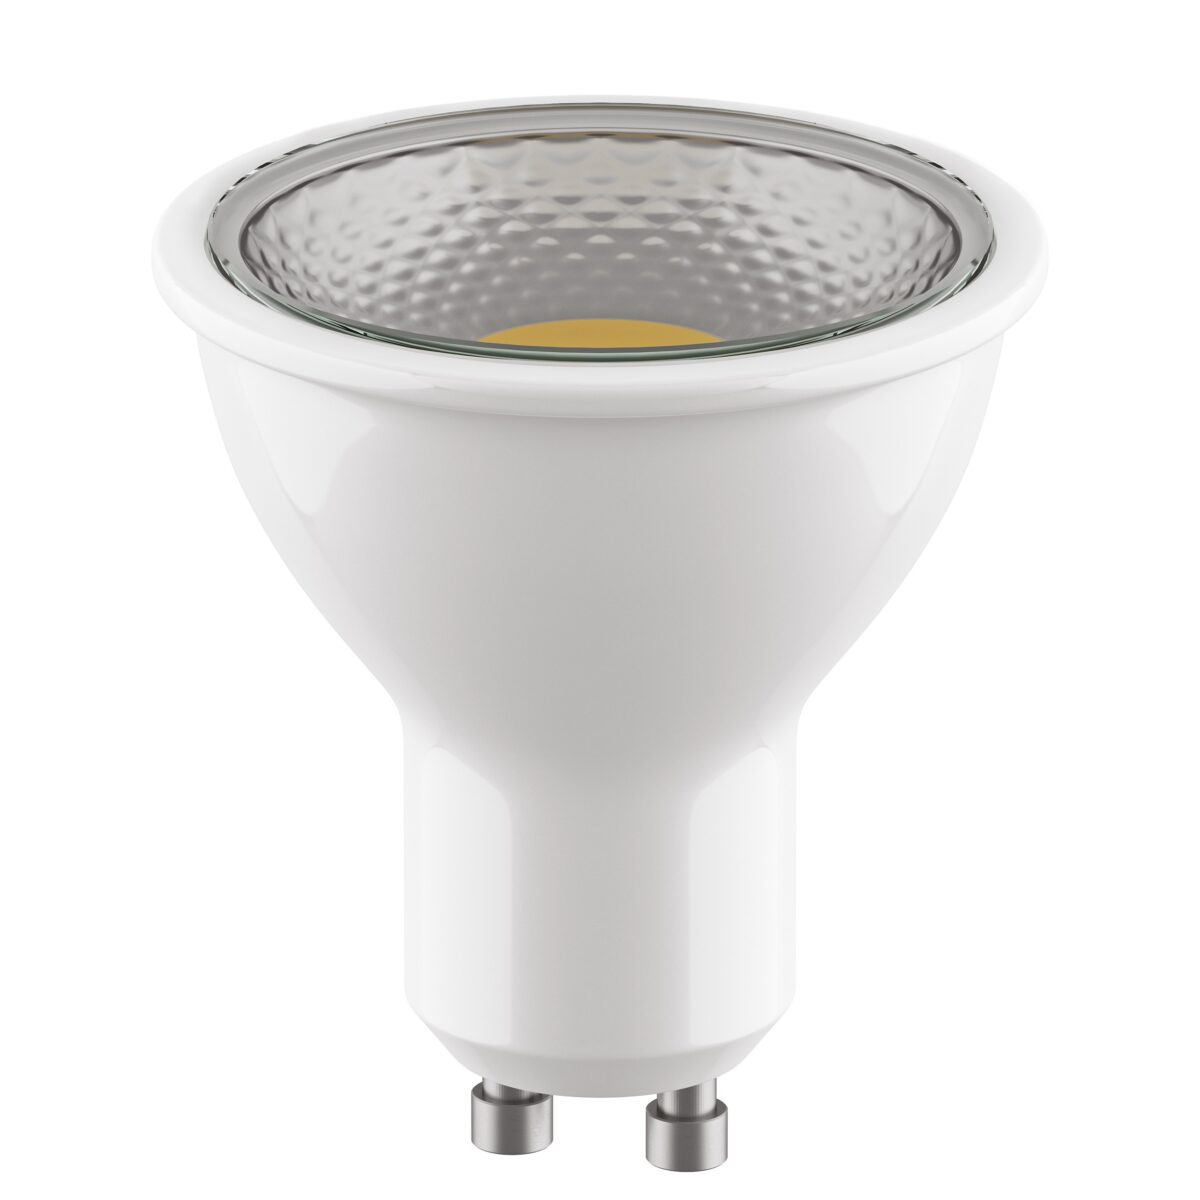 940284 Лампа LED 220V HP16 GU10 7W=60W 350LM 55G CL 4000K 20000H (в комплекте)